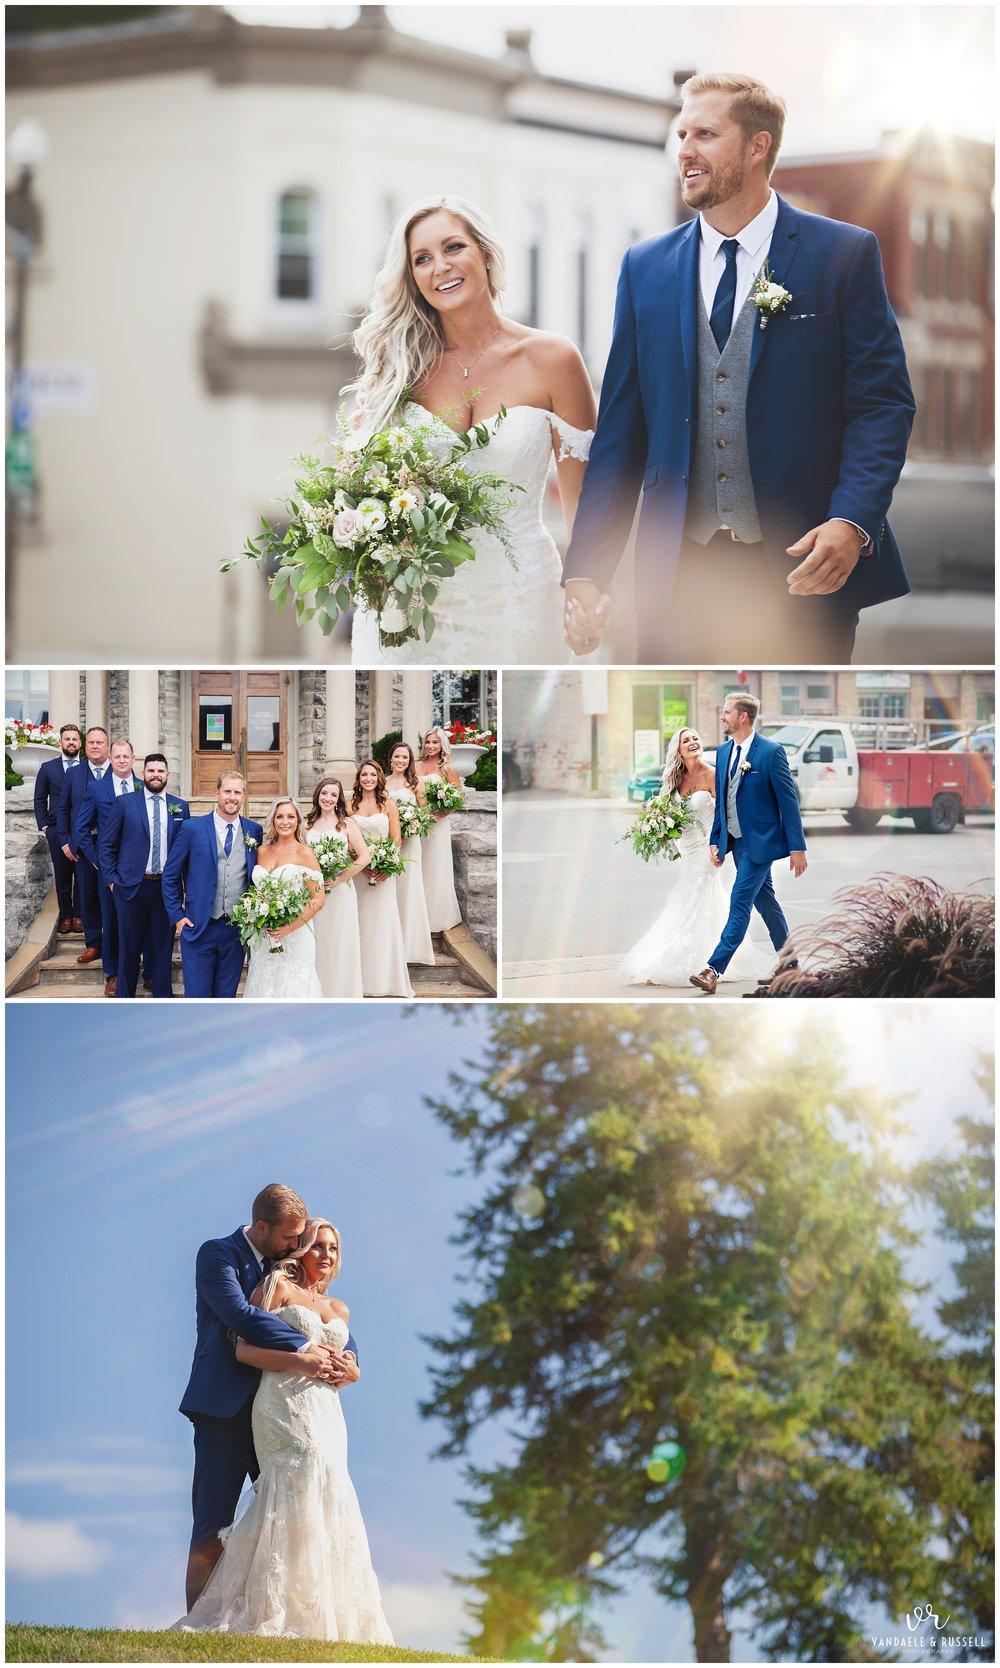 VanDaele-Russell-Wedding-Photography-London-Toronto-Ontario_0156.jpg